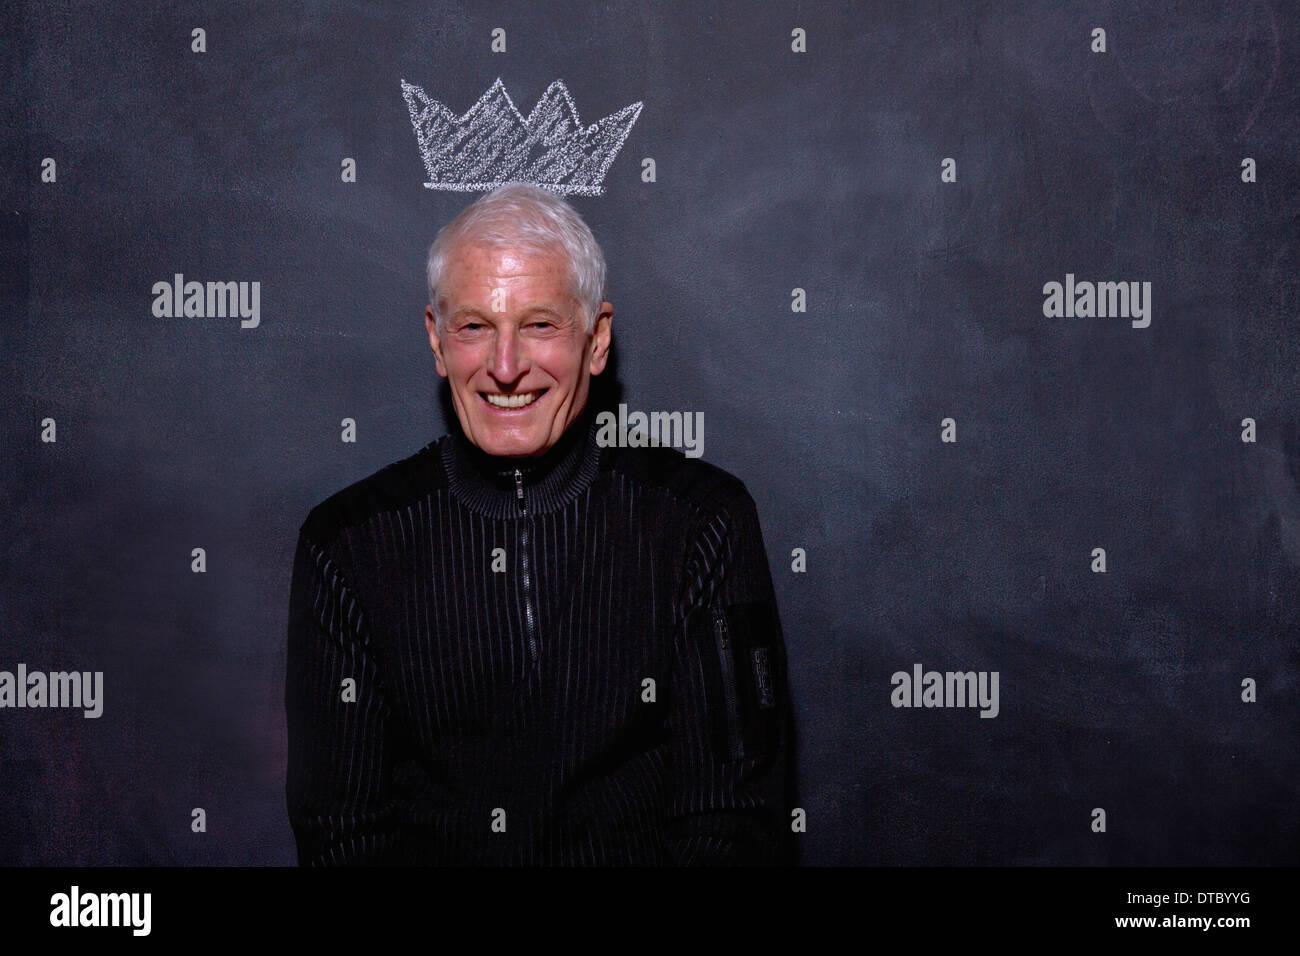 Portrait of senior man in front of chalked crown on blackboard - Stock Image